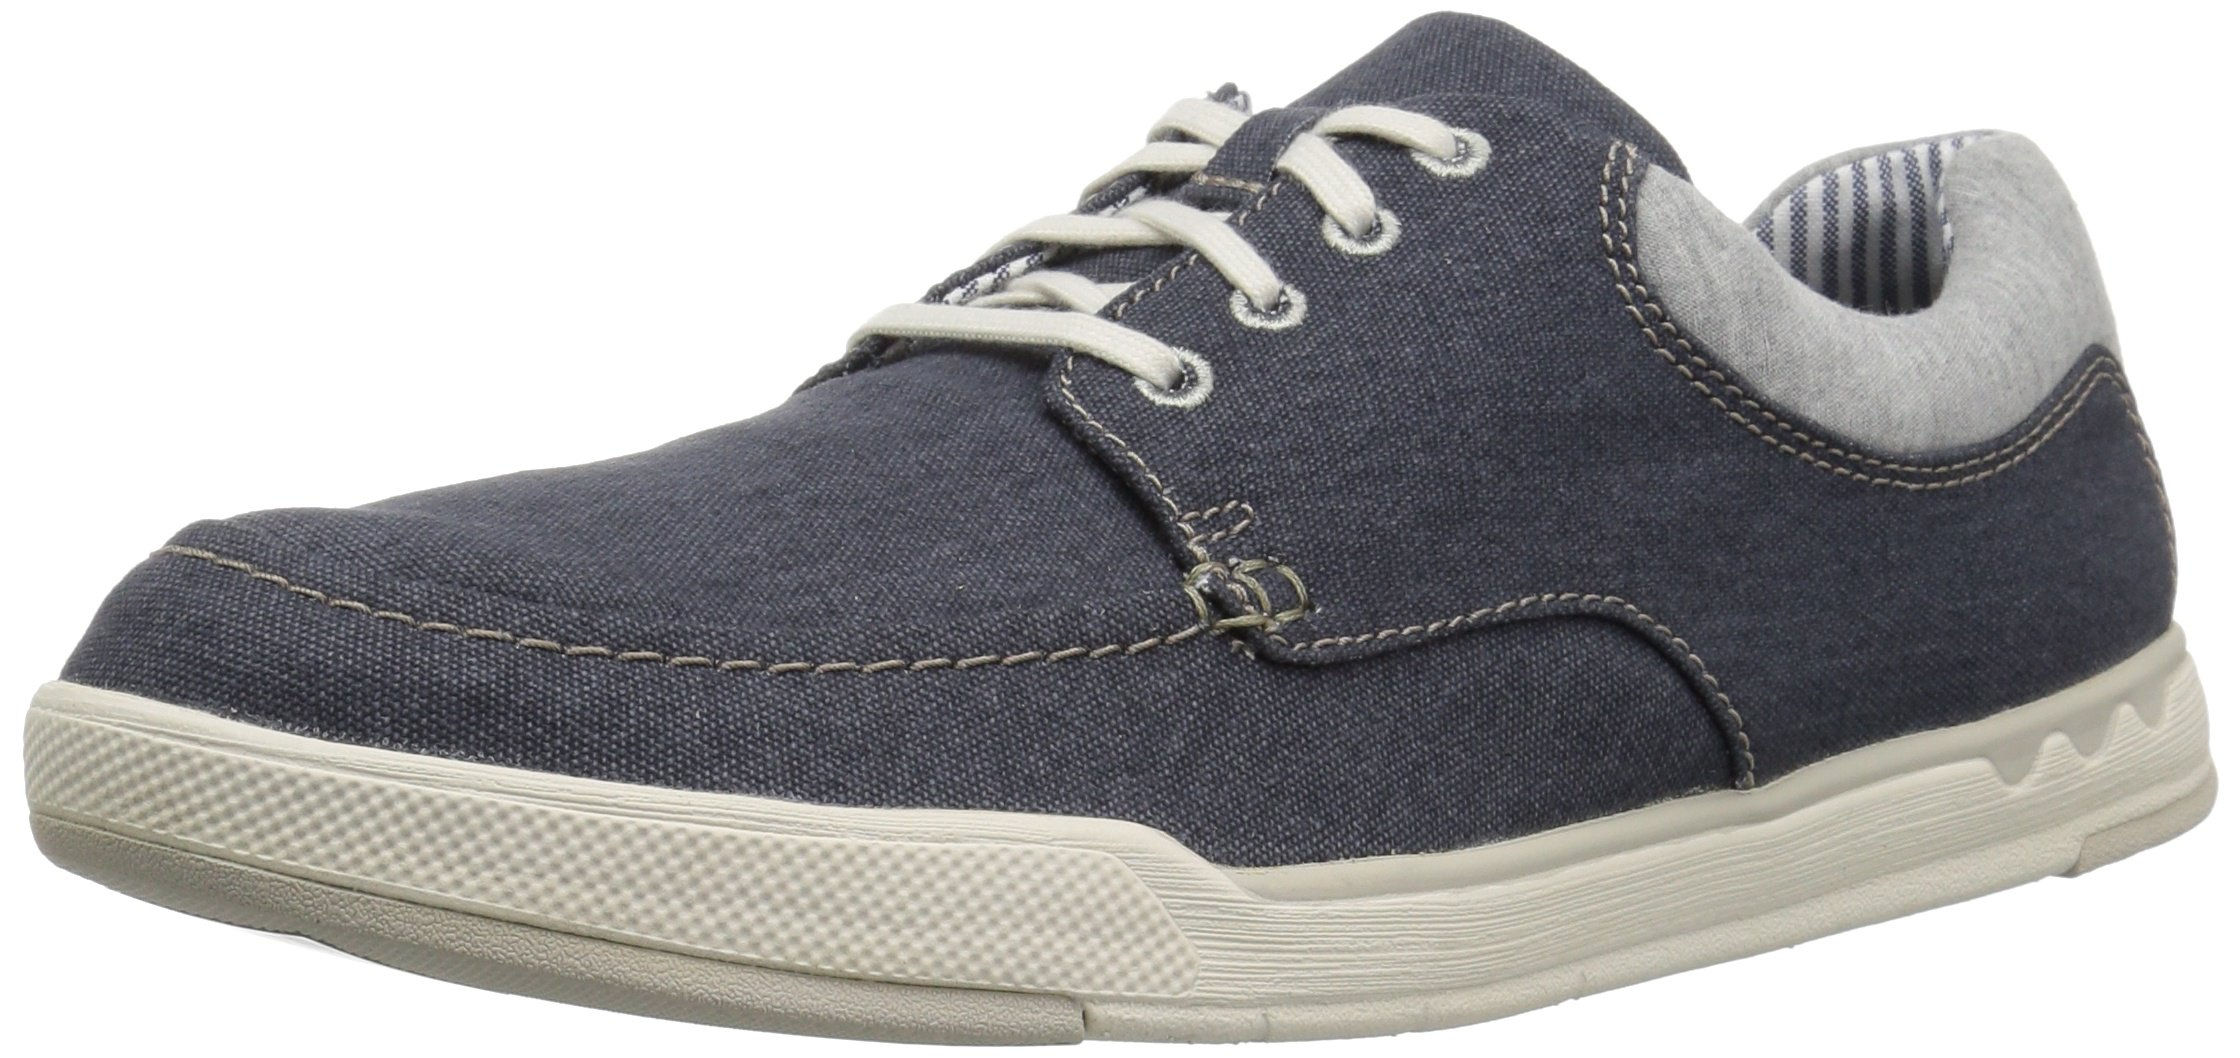 CLARKS Men's Step Isle Lace Sneaker, Navy Canvas, 7 Medium US